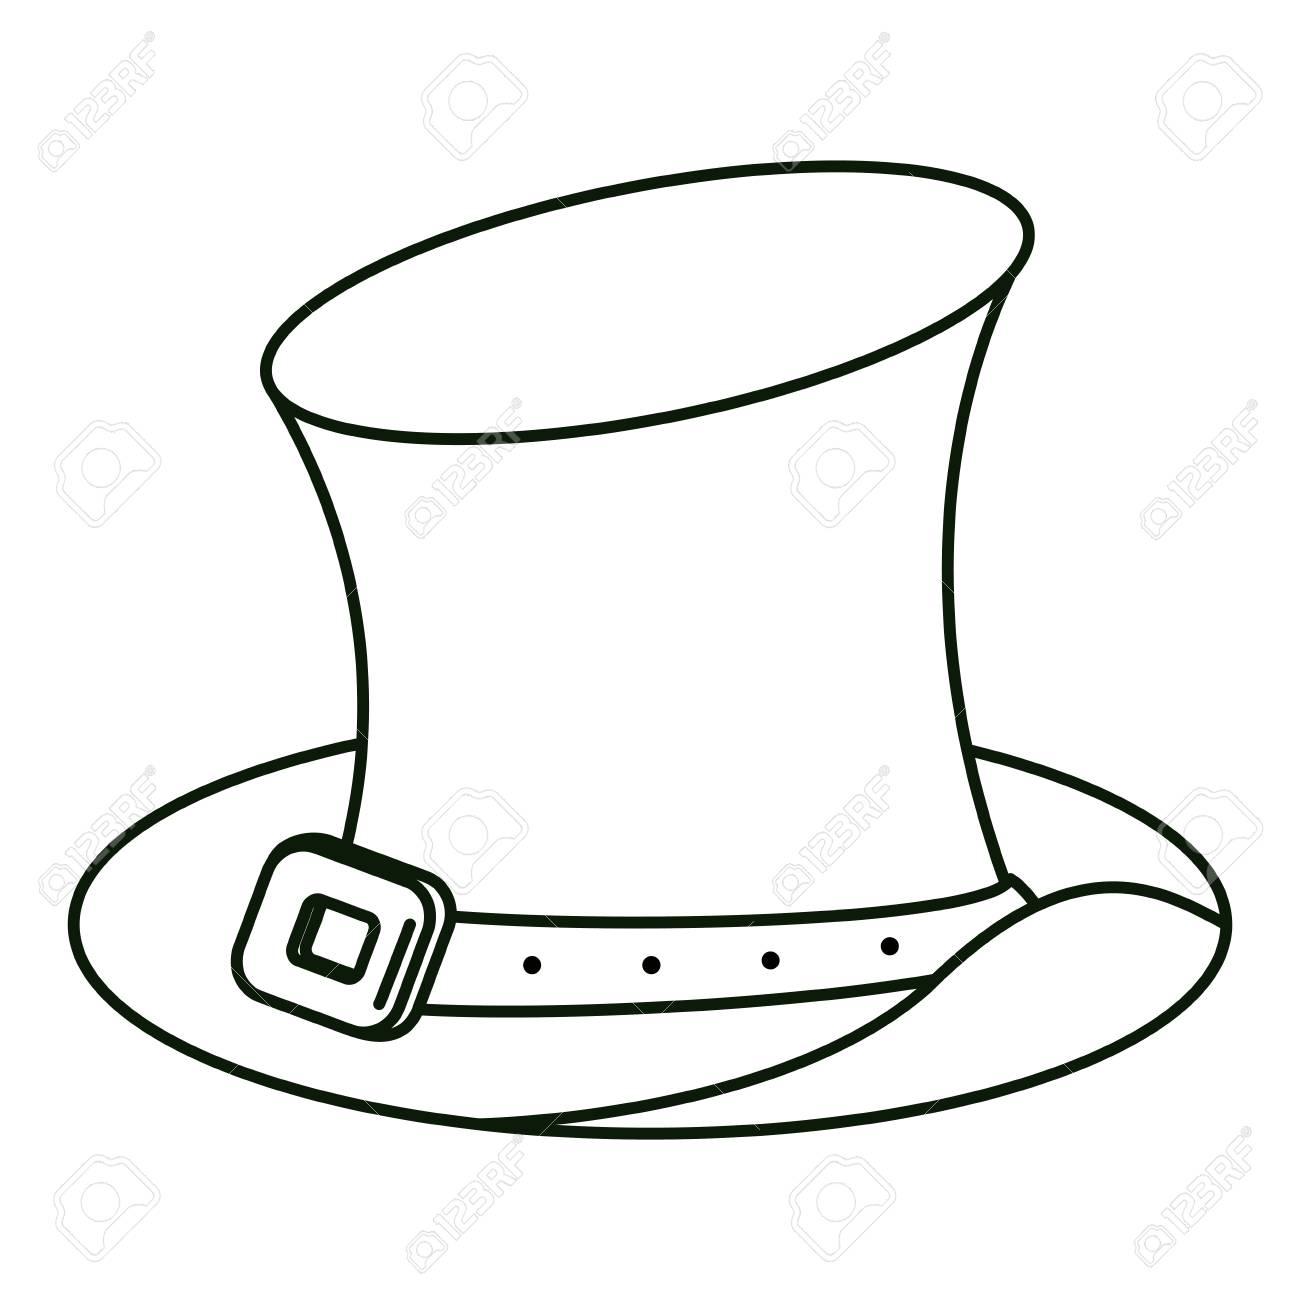 cae2df622d1 Irish elf hat in black and white vector illustration graphic design Stock  Vector - 109640164